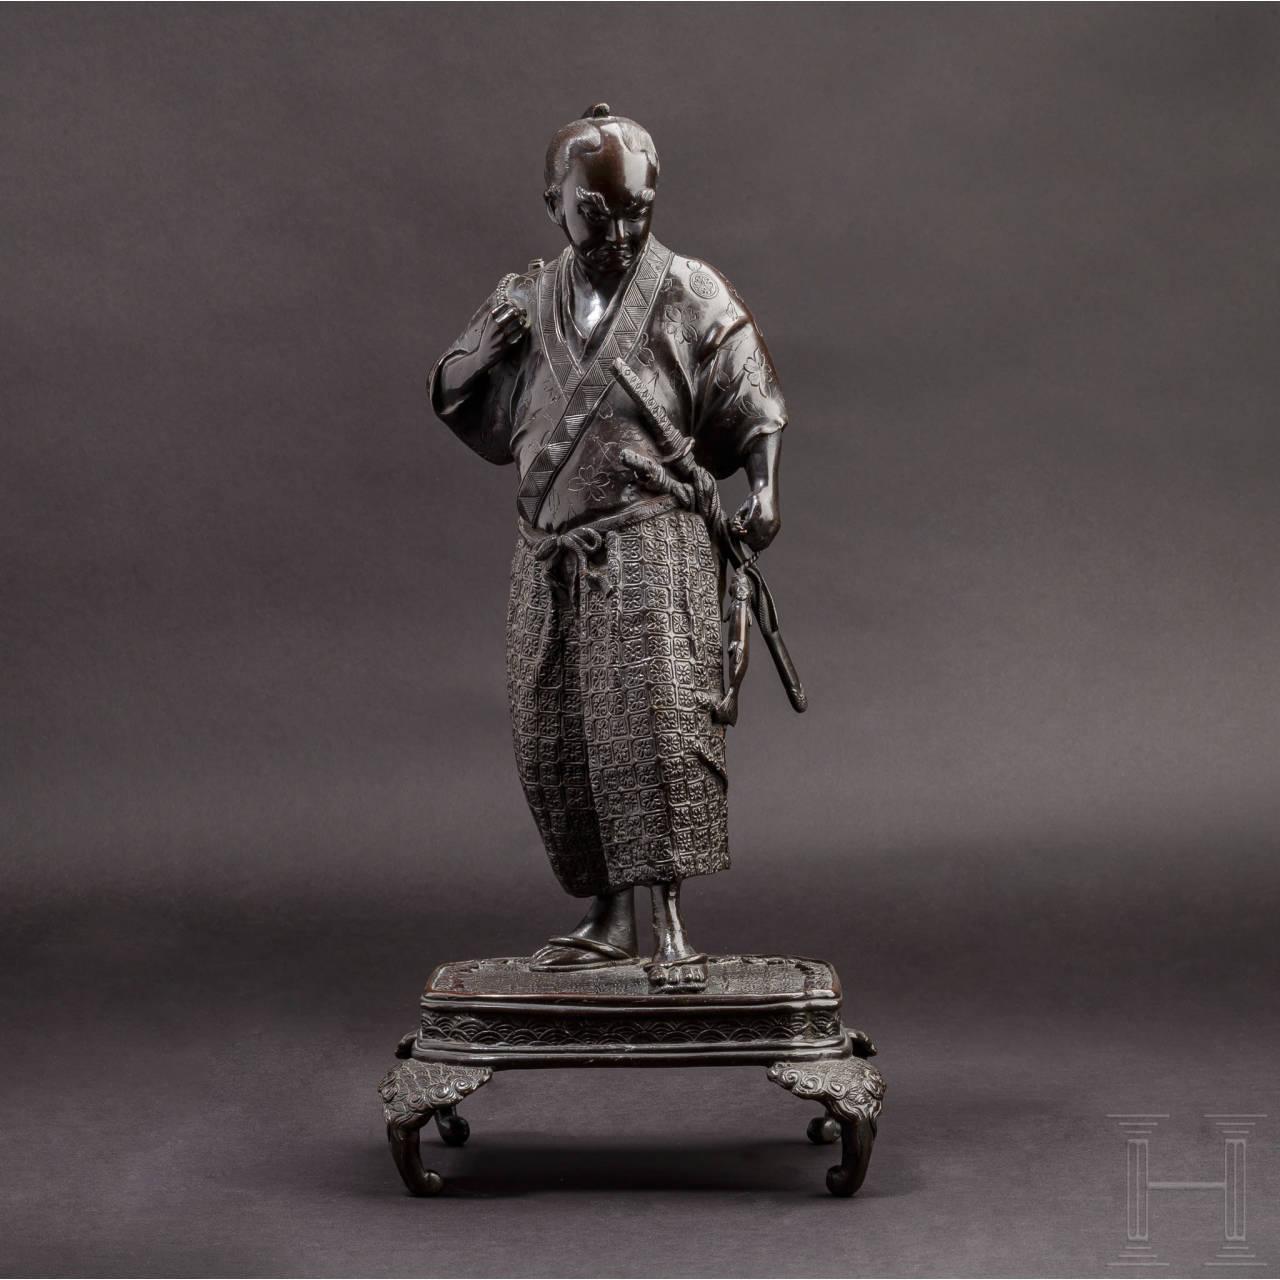 Bronzefigur eines Samurai, Japan, Meiji-/Taisho-Periode